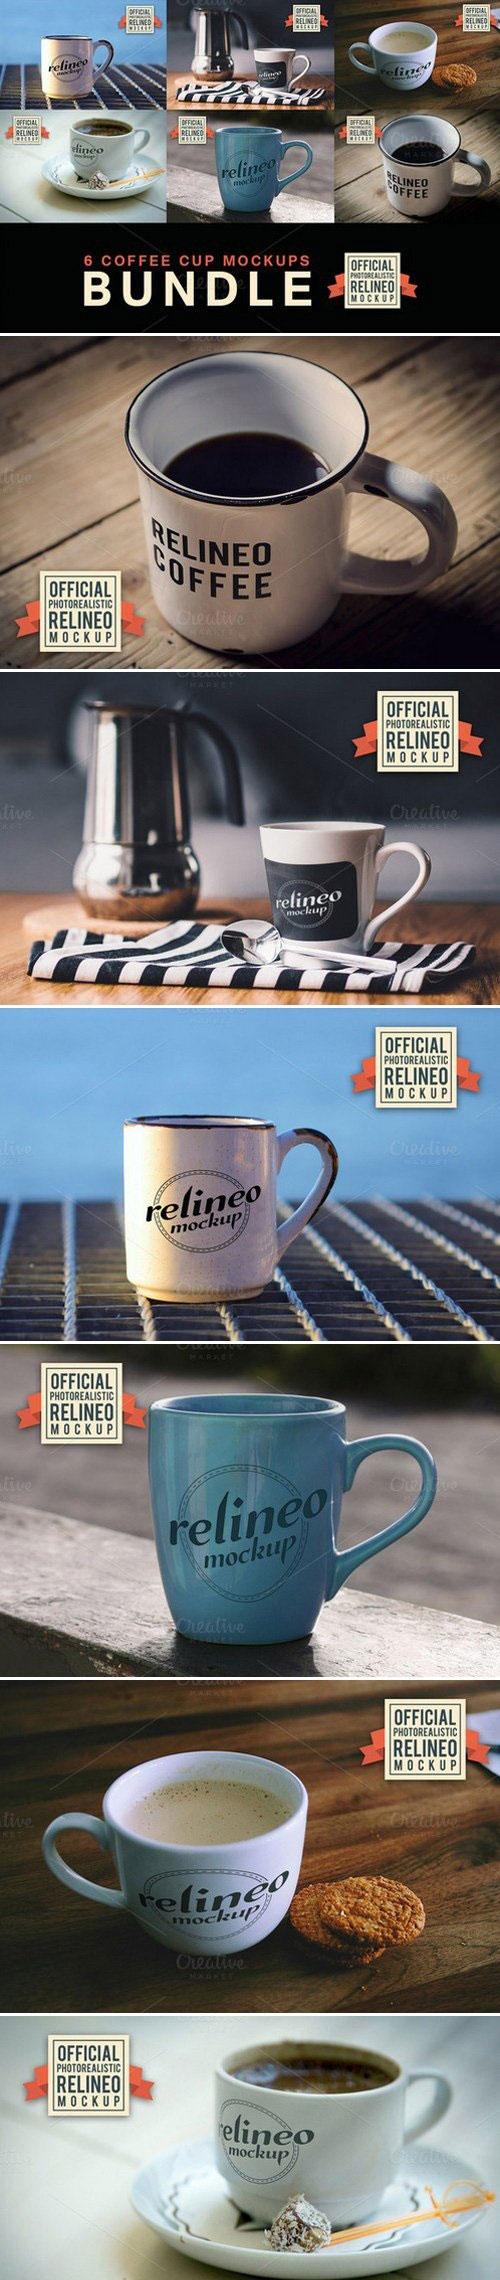 CM-6-Coffee-Cup-Mockups-399160